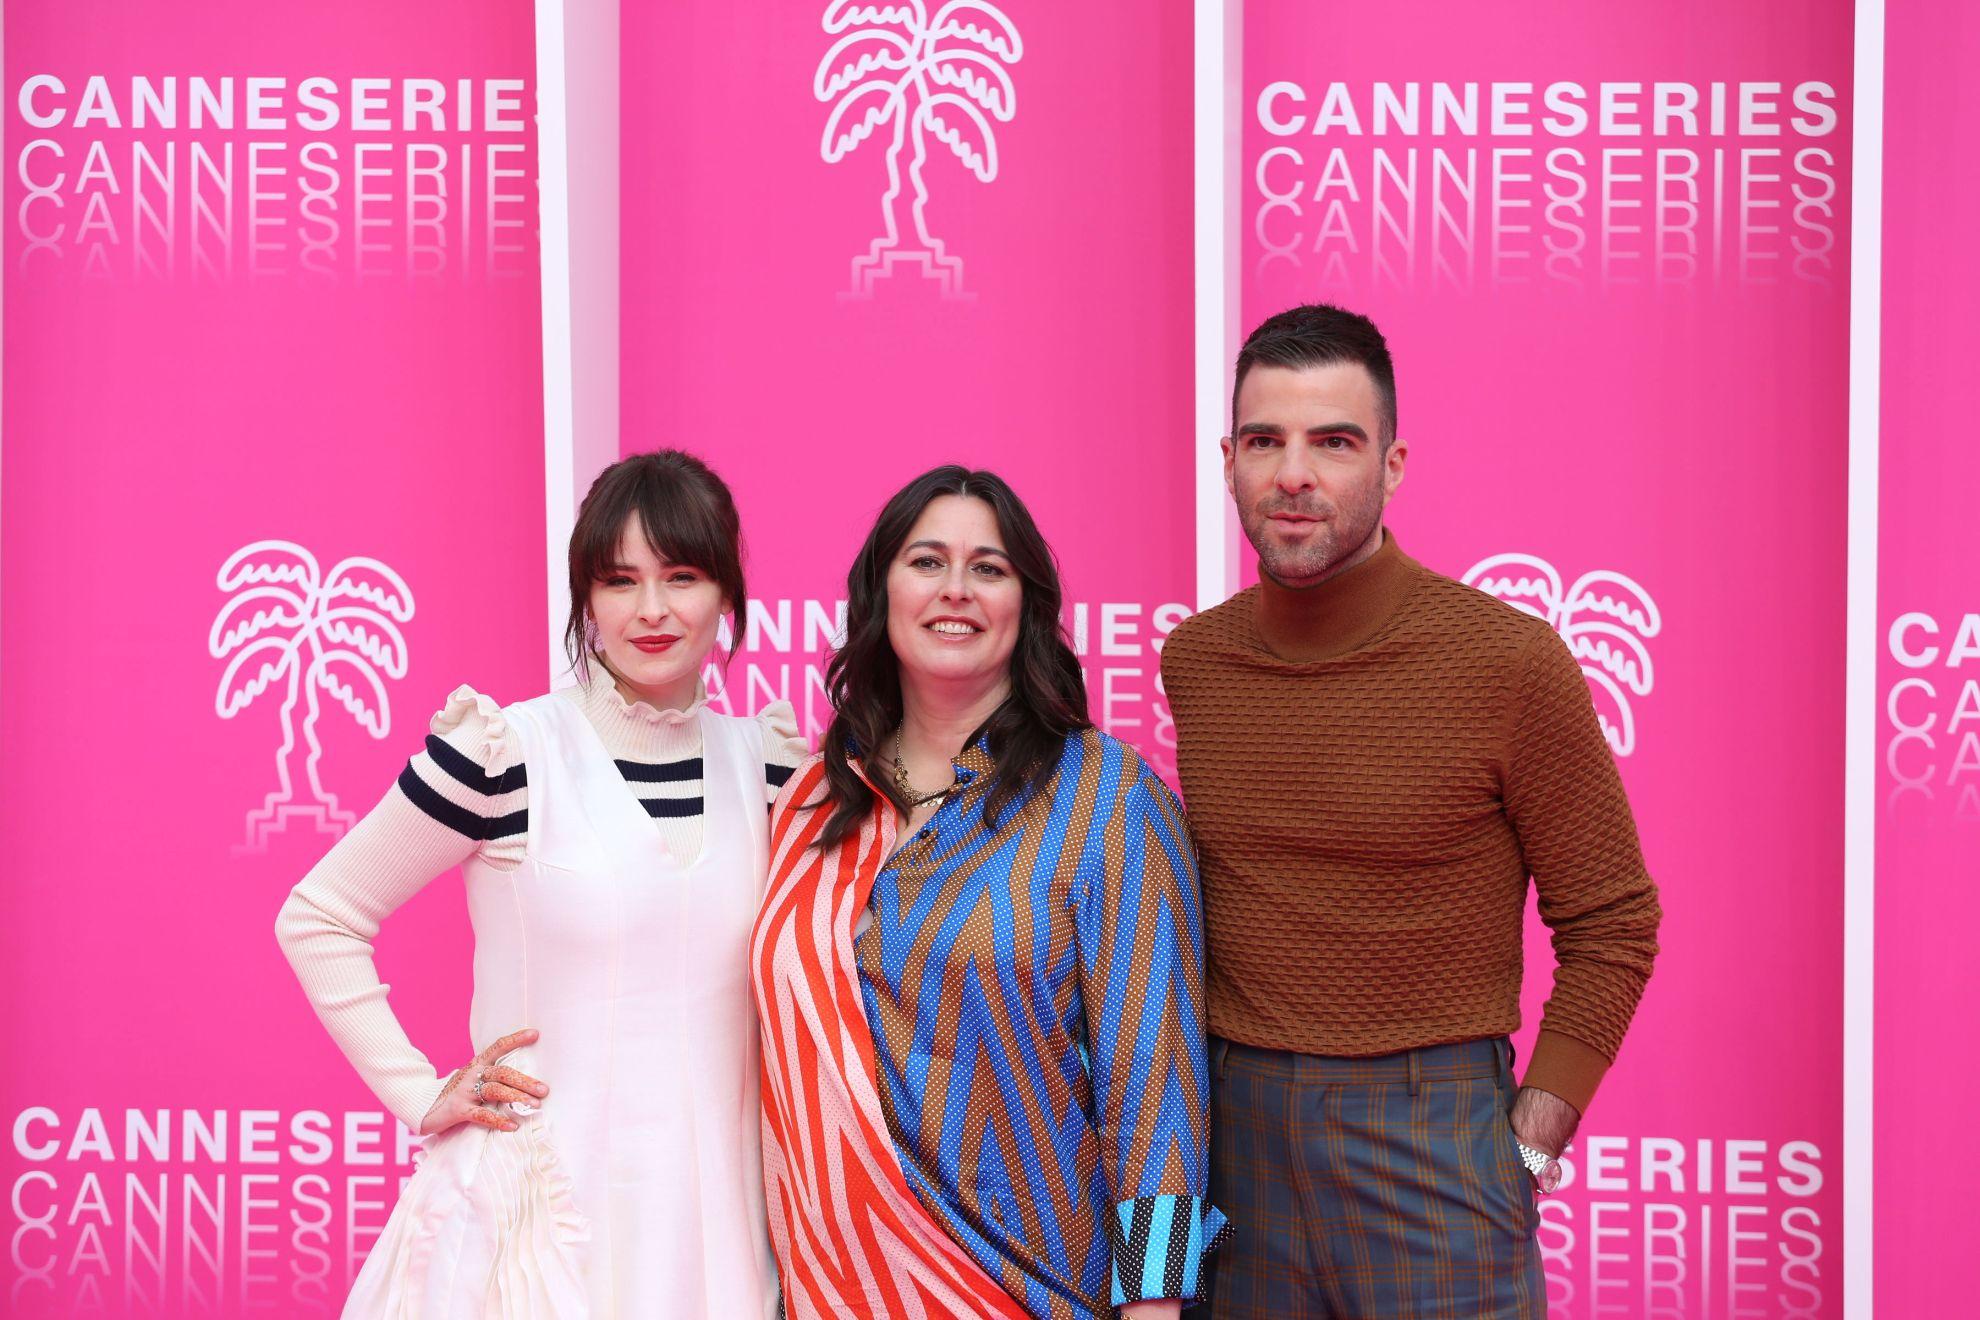 Canneseries 2019: una parte del cast di NOS4A2 sul pink carpet